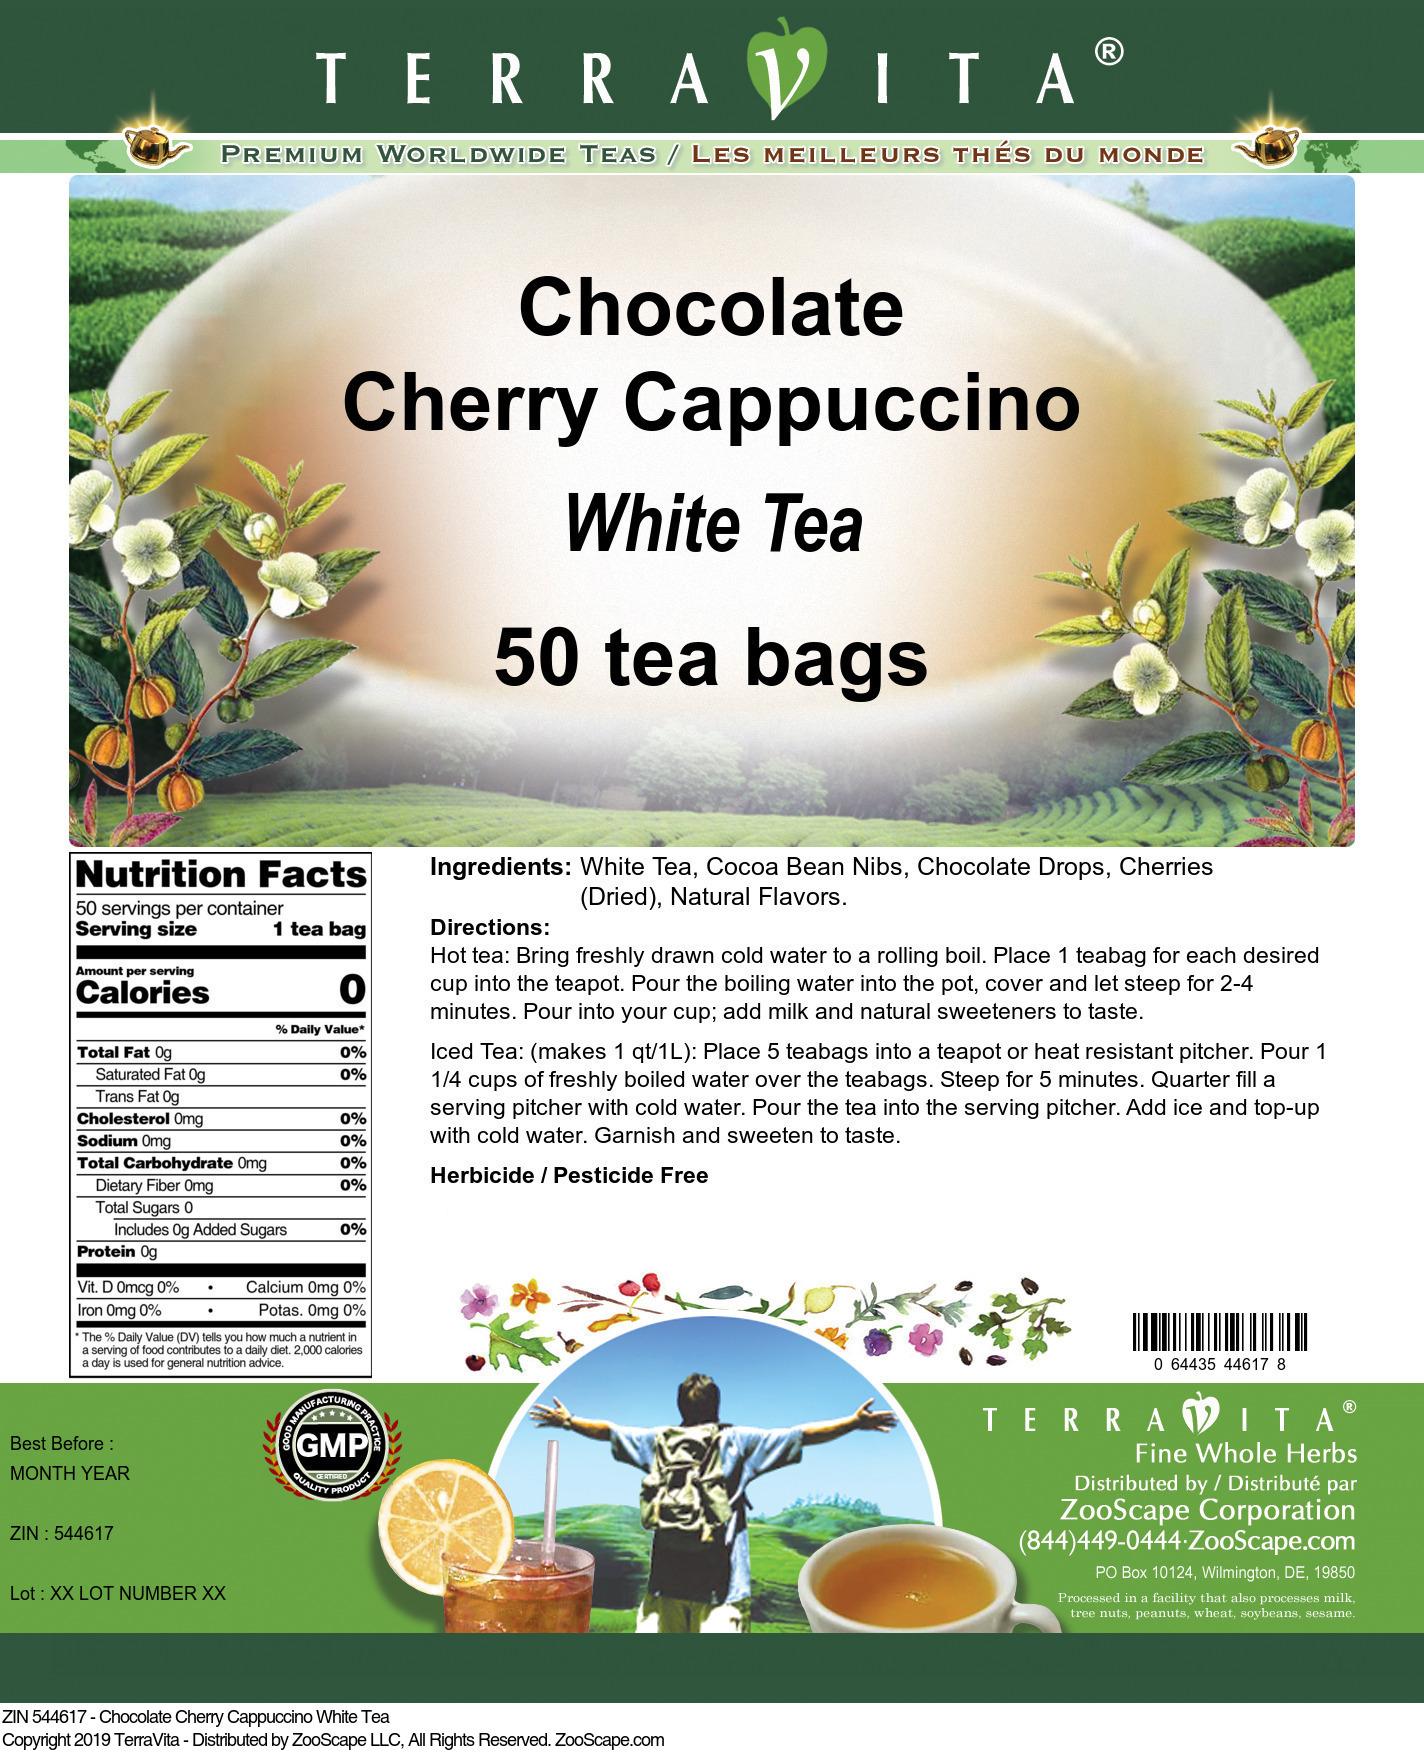 Chocolate Cherry Cappuccino White Tea